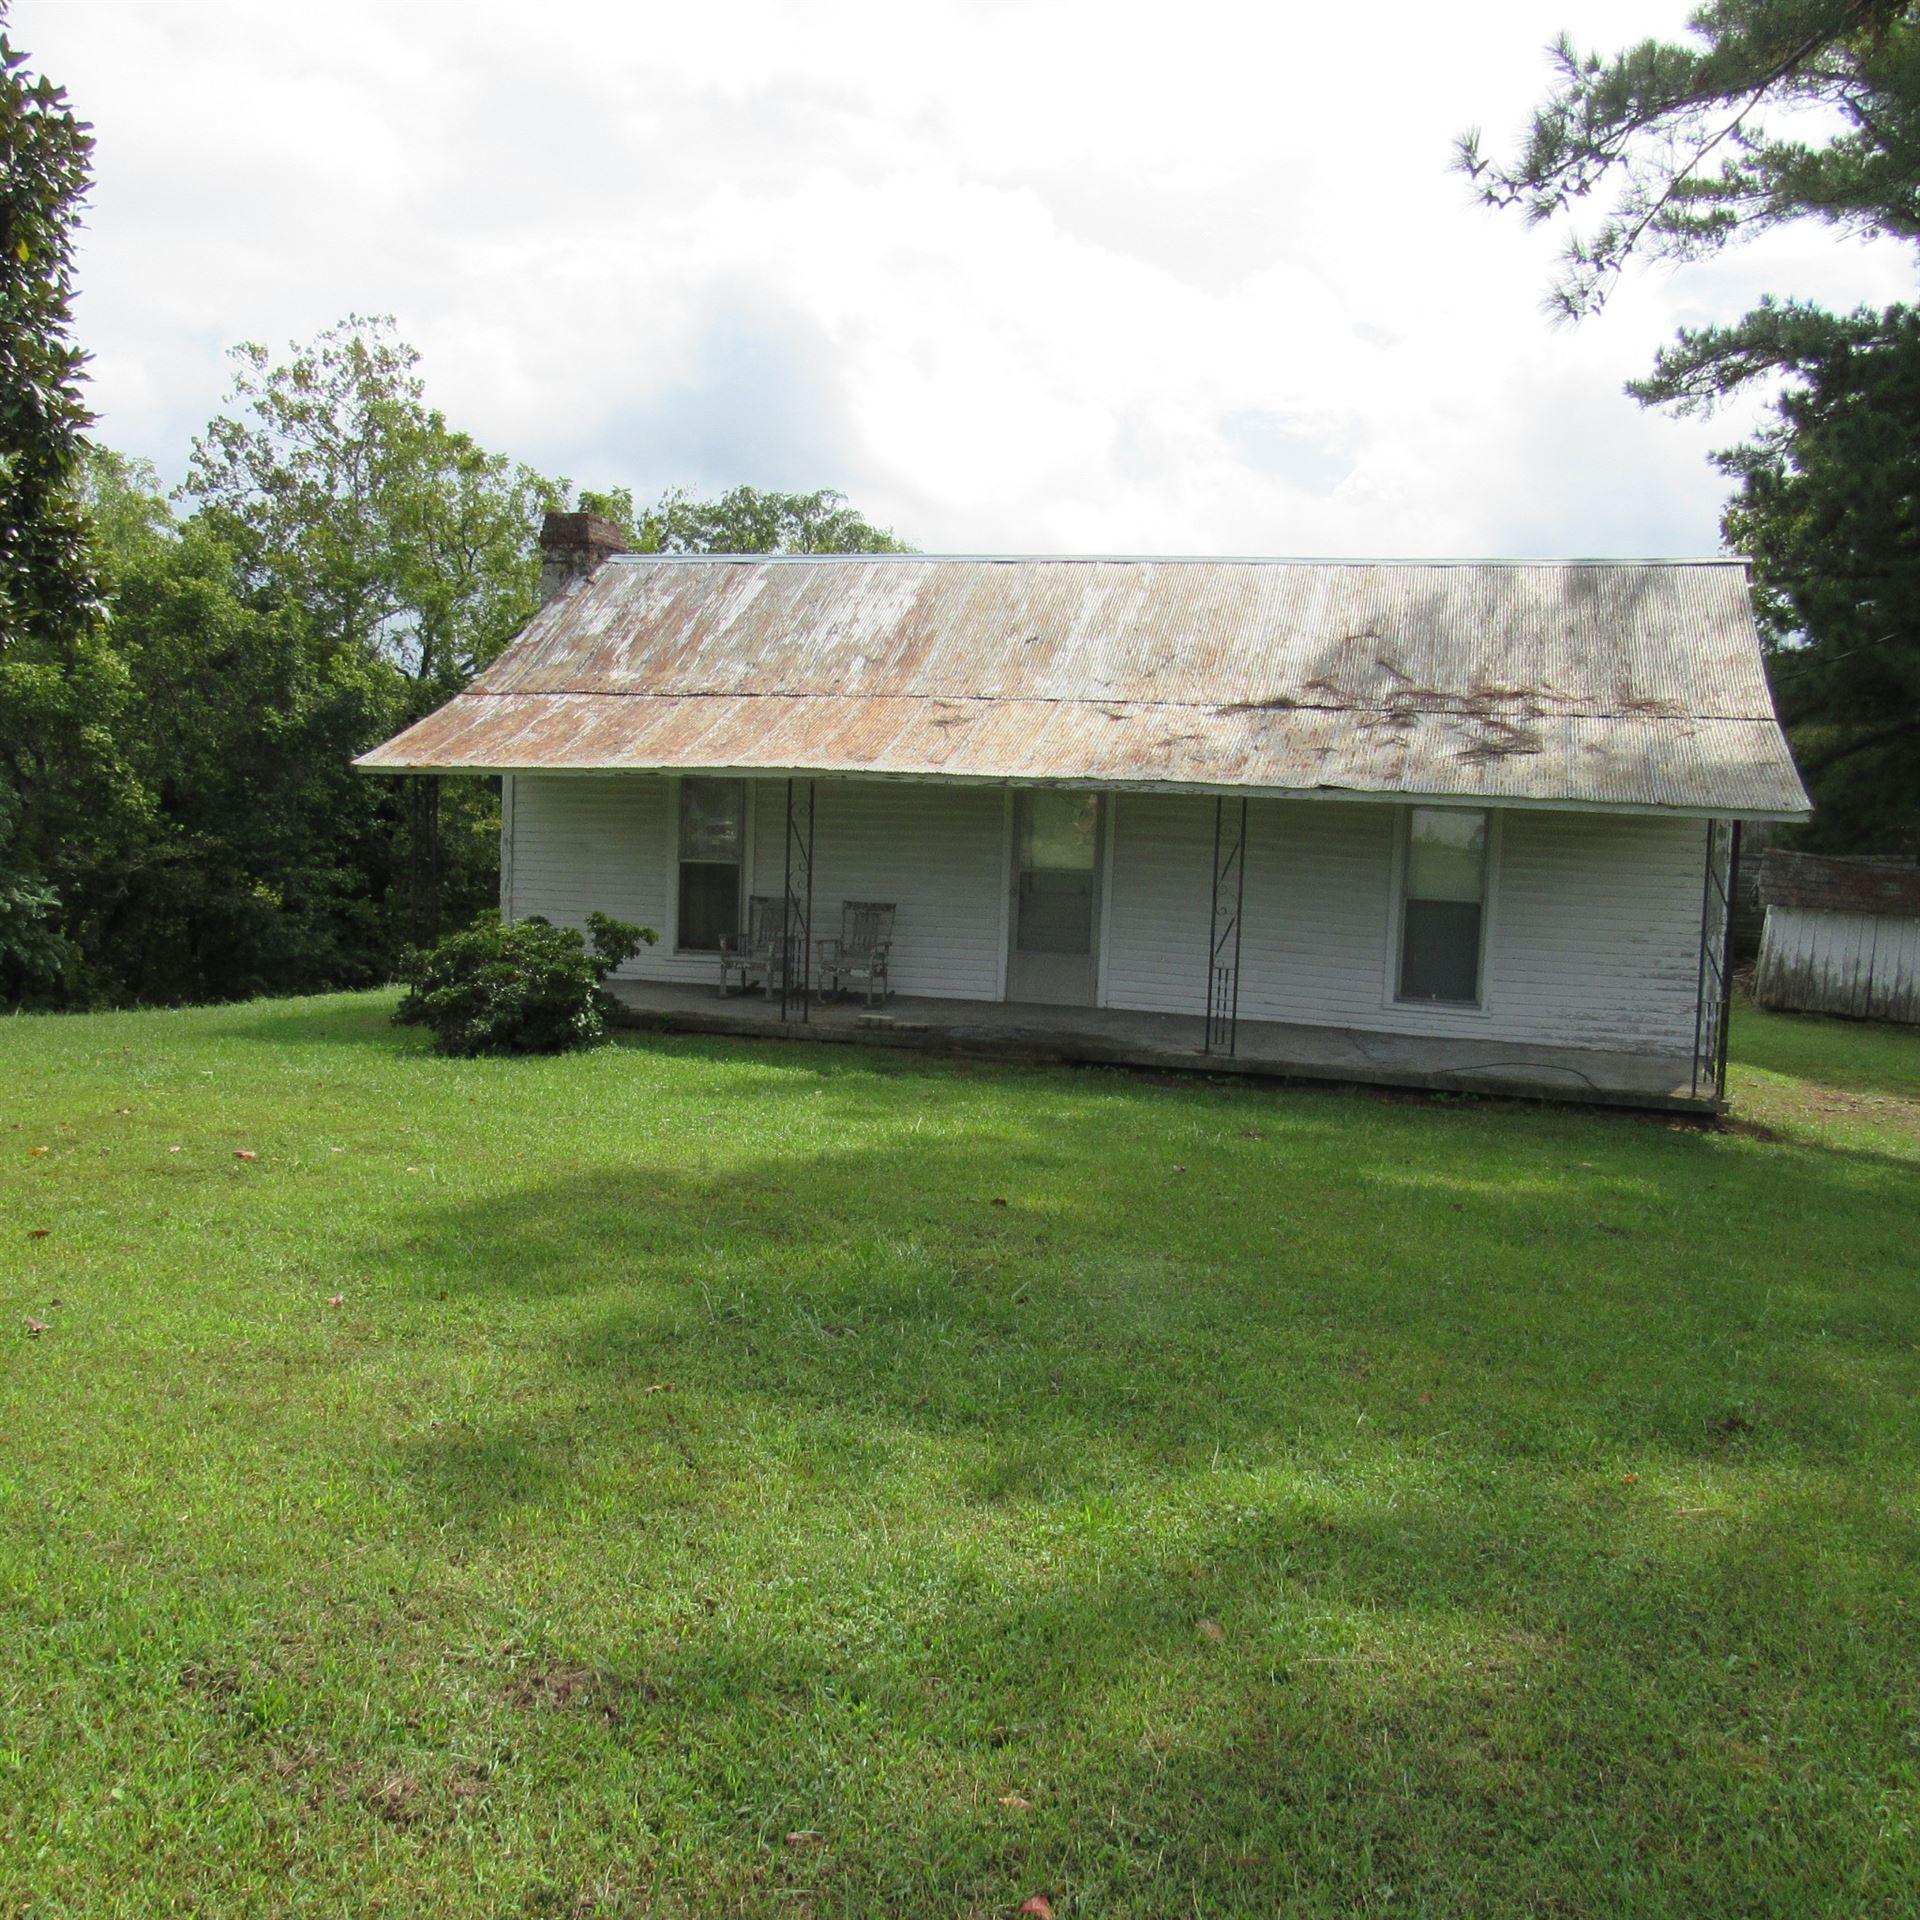 Photo of 462 Pea Ridge Rd. E, Elmwood, TN 38560 (MLS # 2293273)